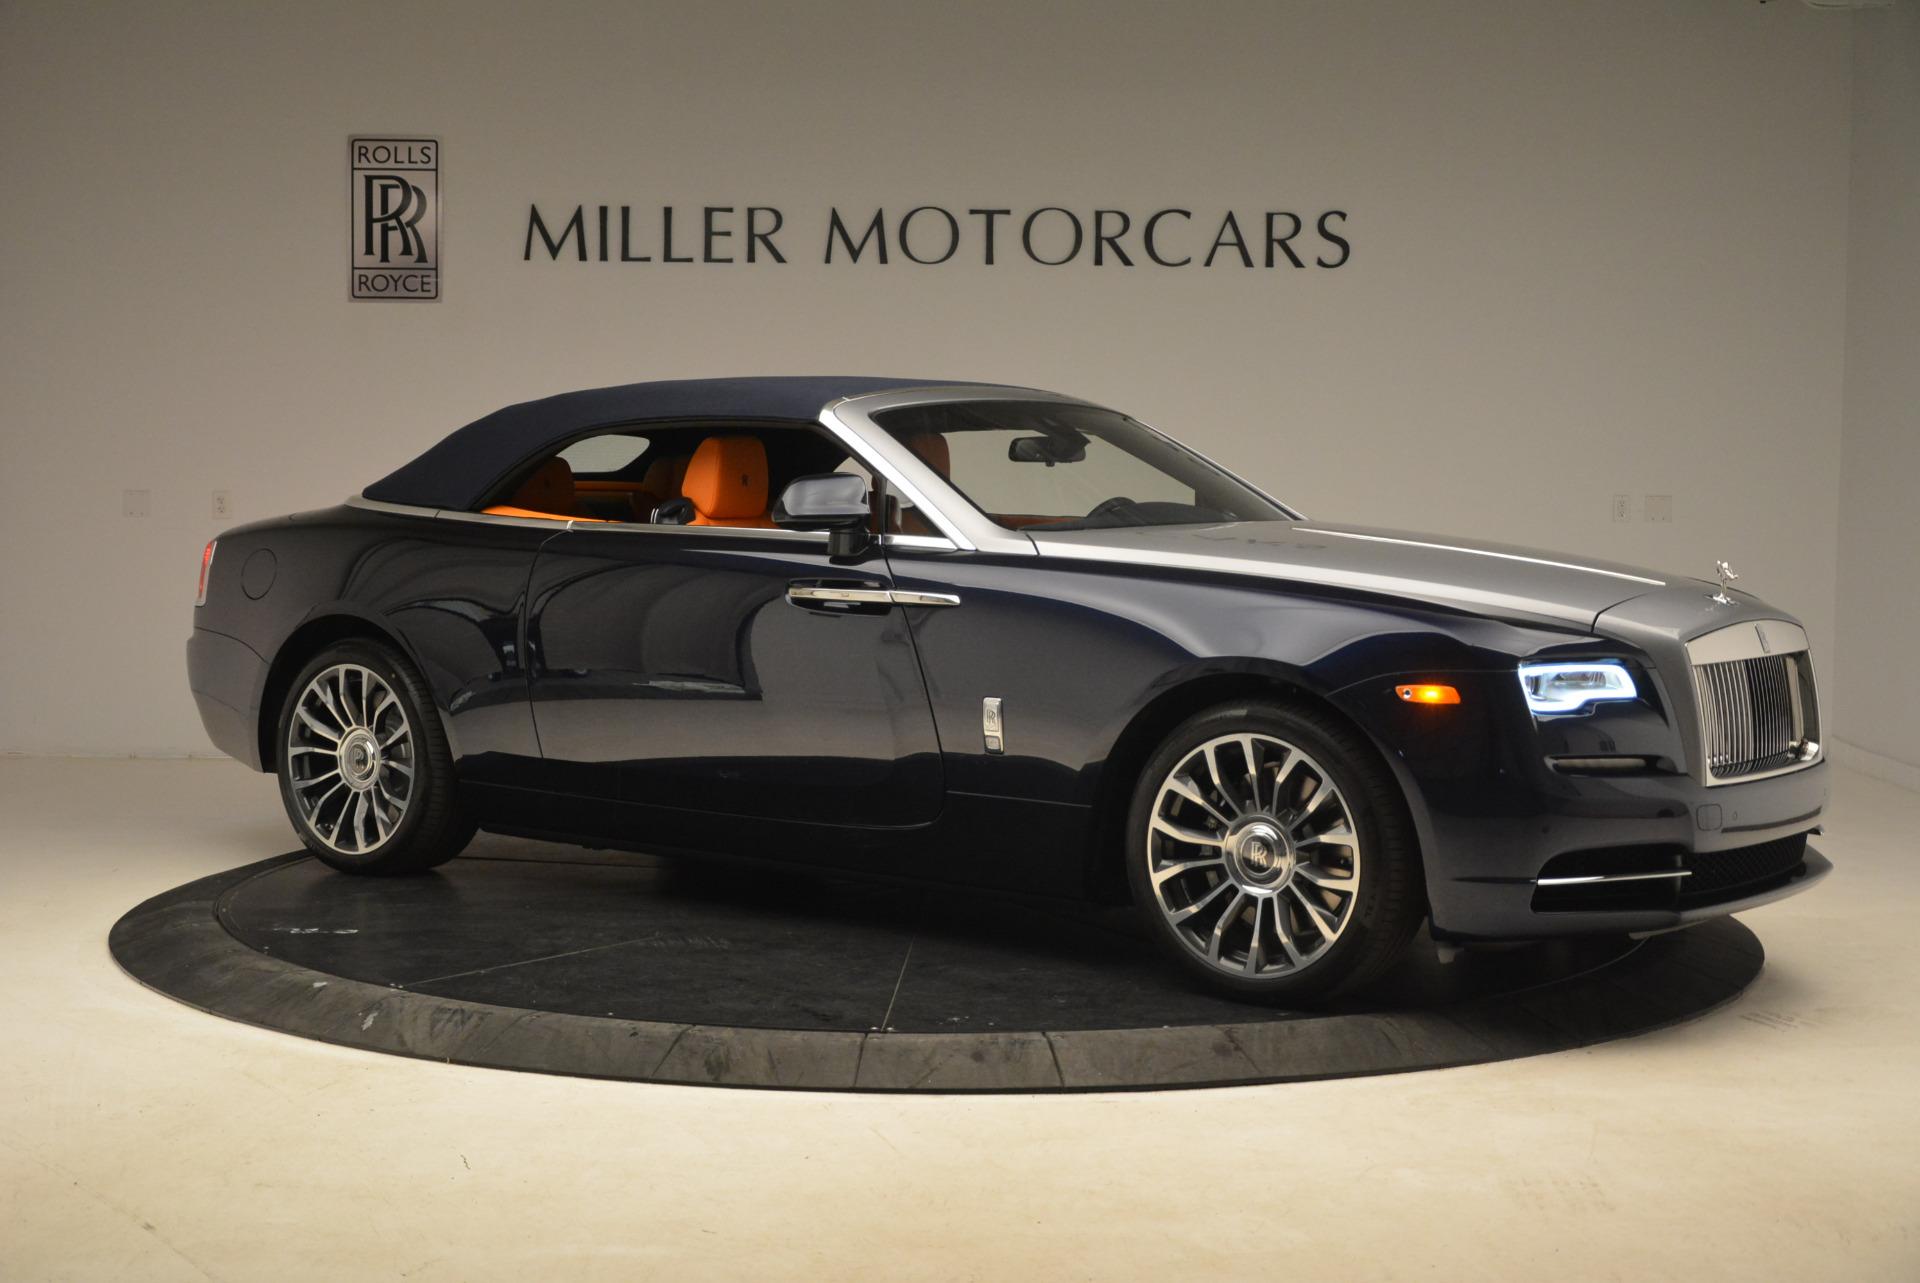 New 2018 Rolls-Royce Dawn  For Sale In Greenwich, CT 2104_p22